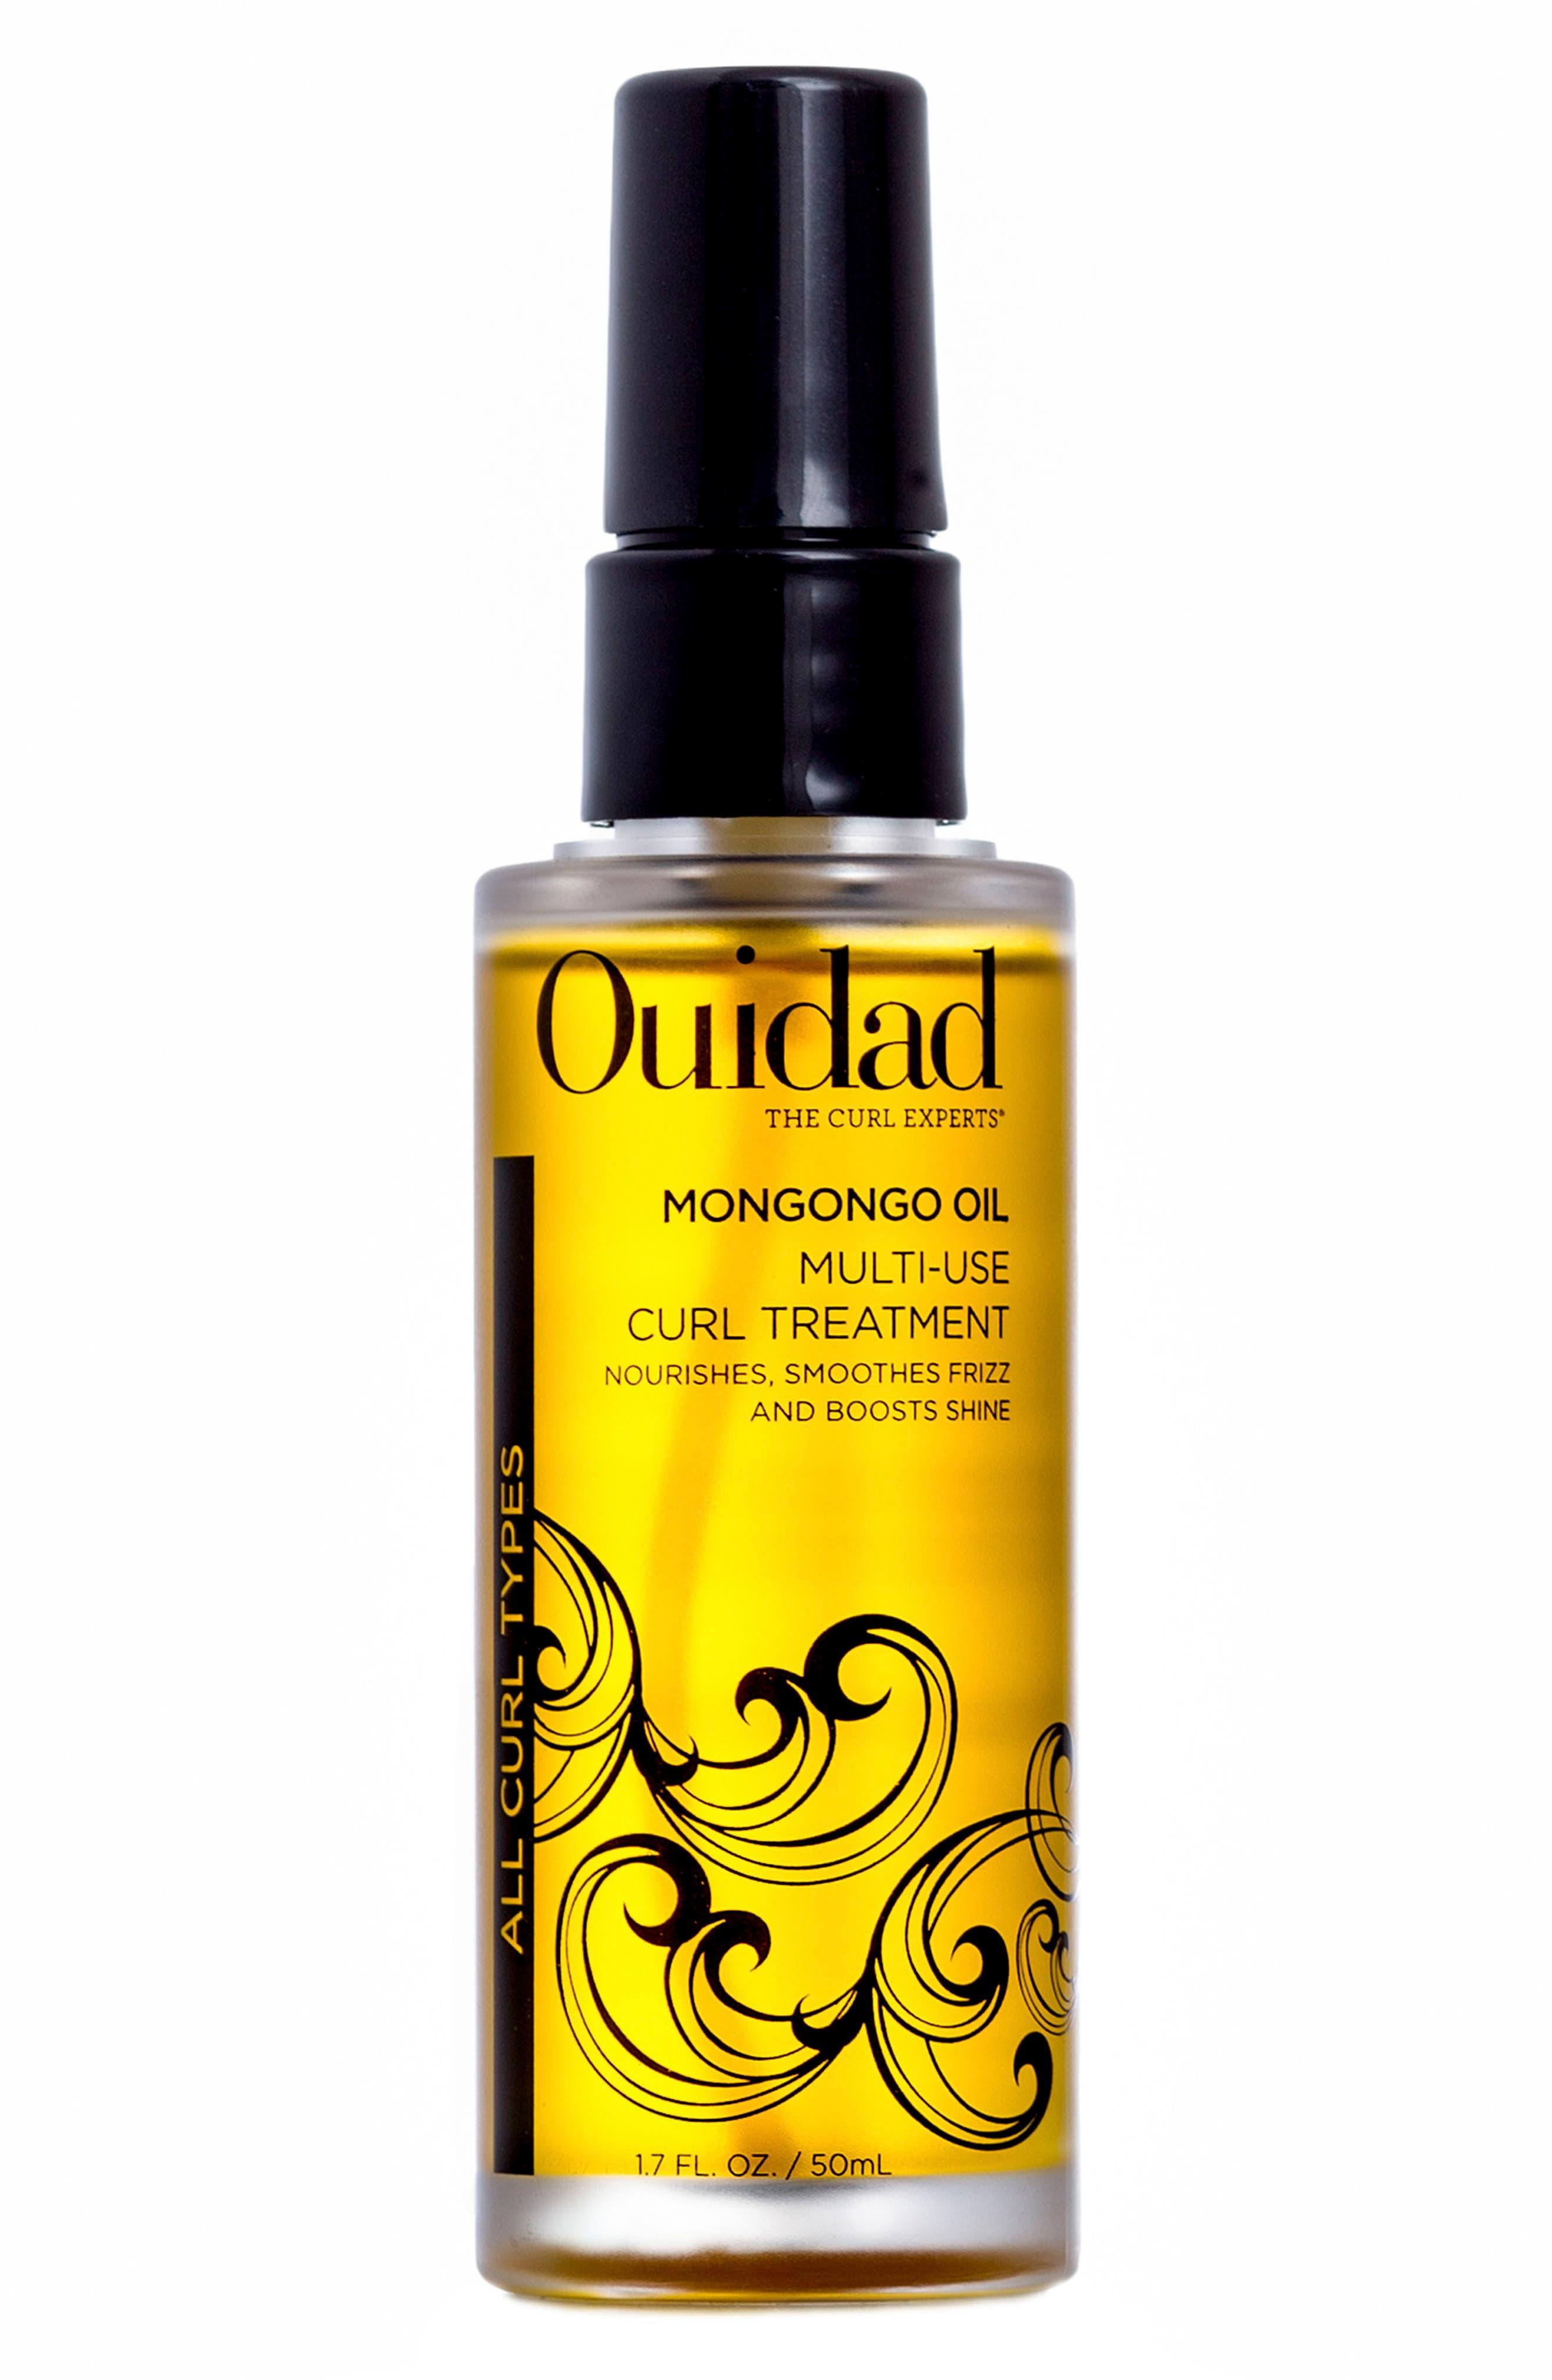 Main Image - Ouidad Mongongo Oil Multi-Use Curl Treatment